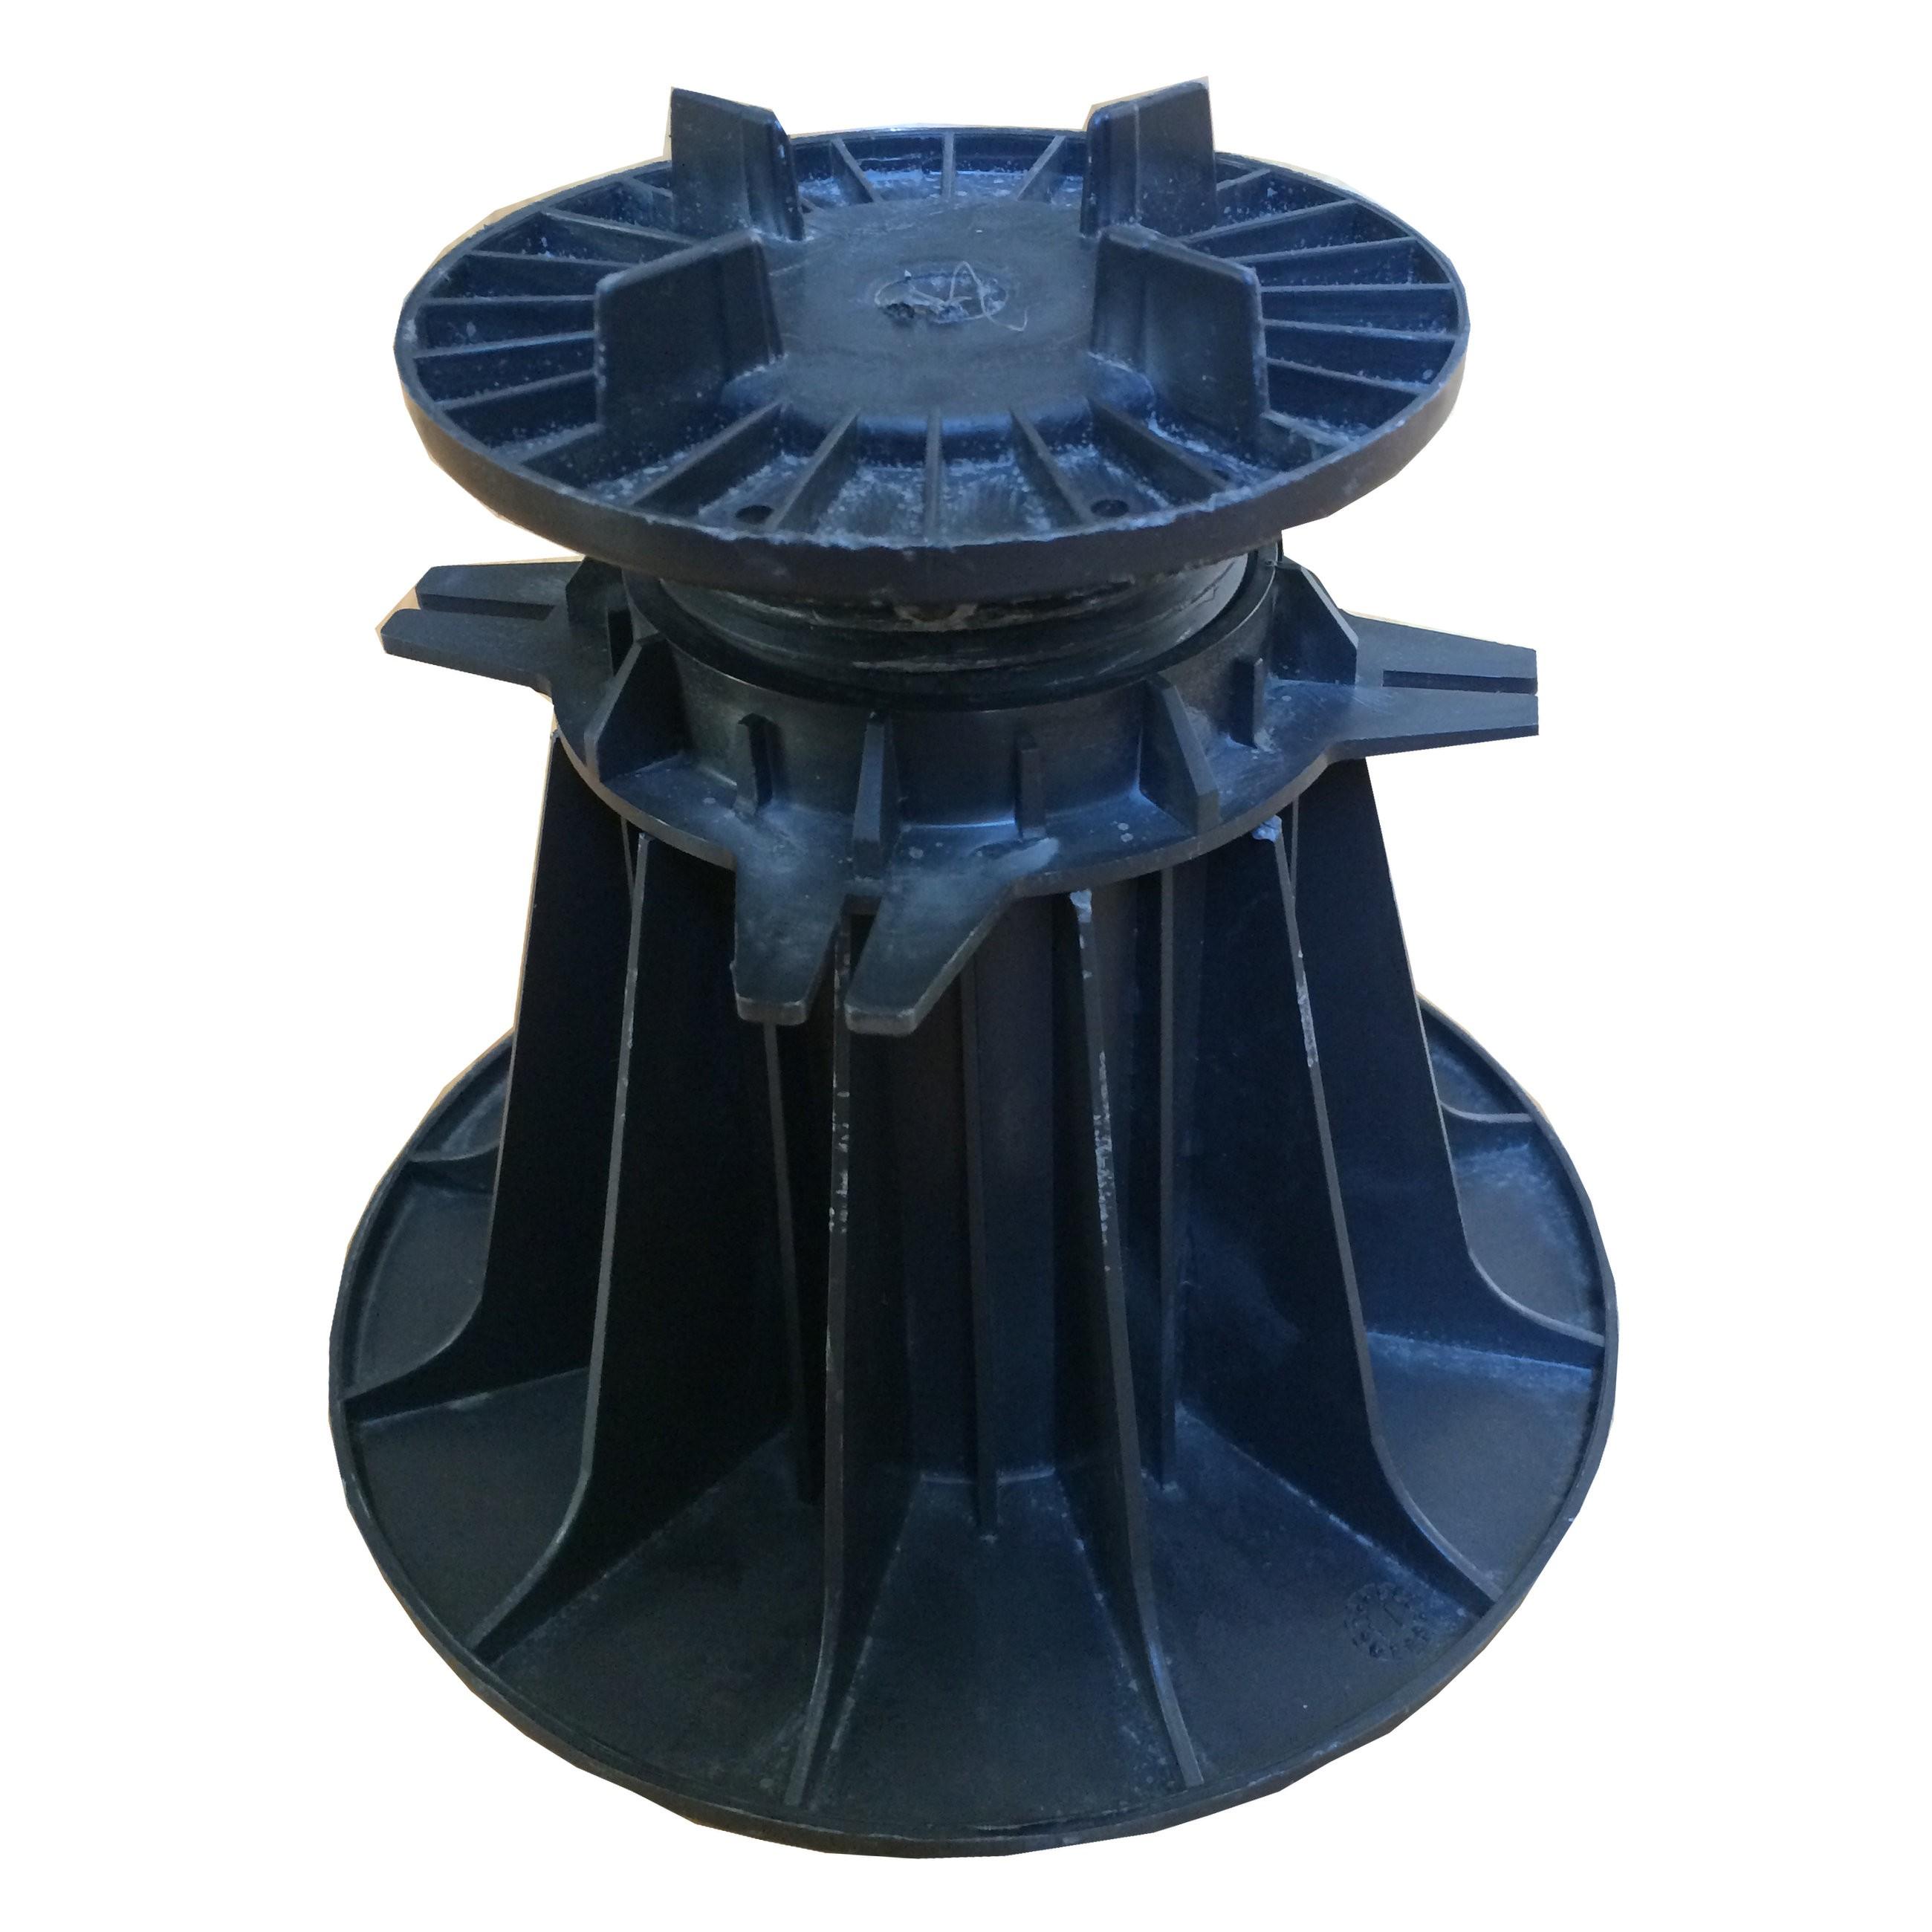 Plot réglable à vérin 150/260 mm, carton de 48